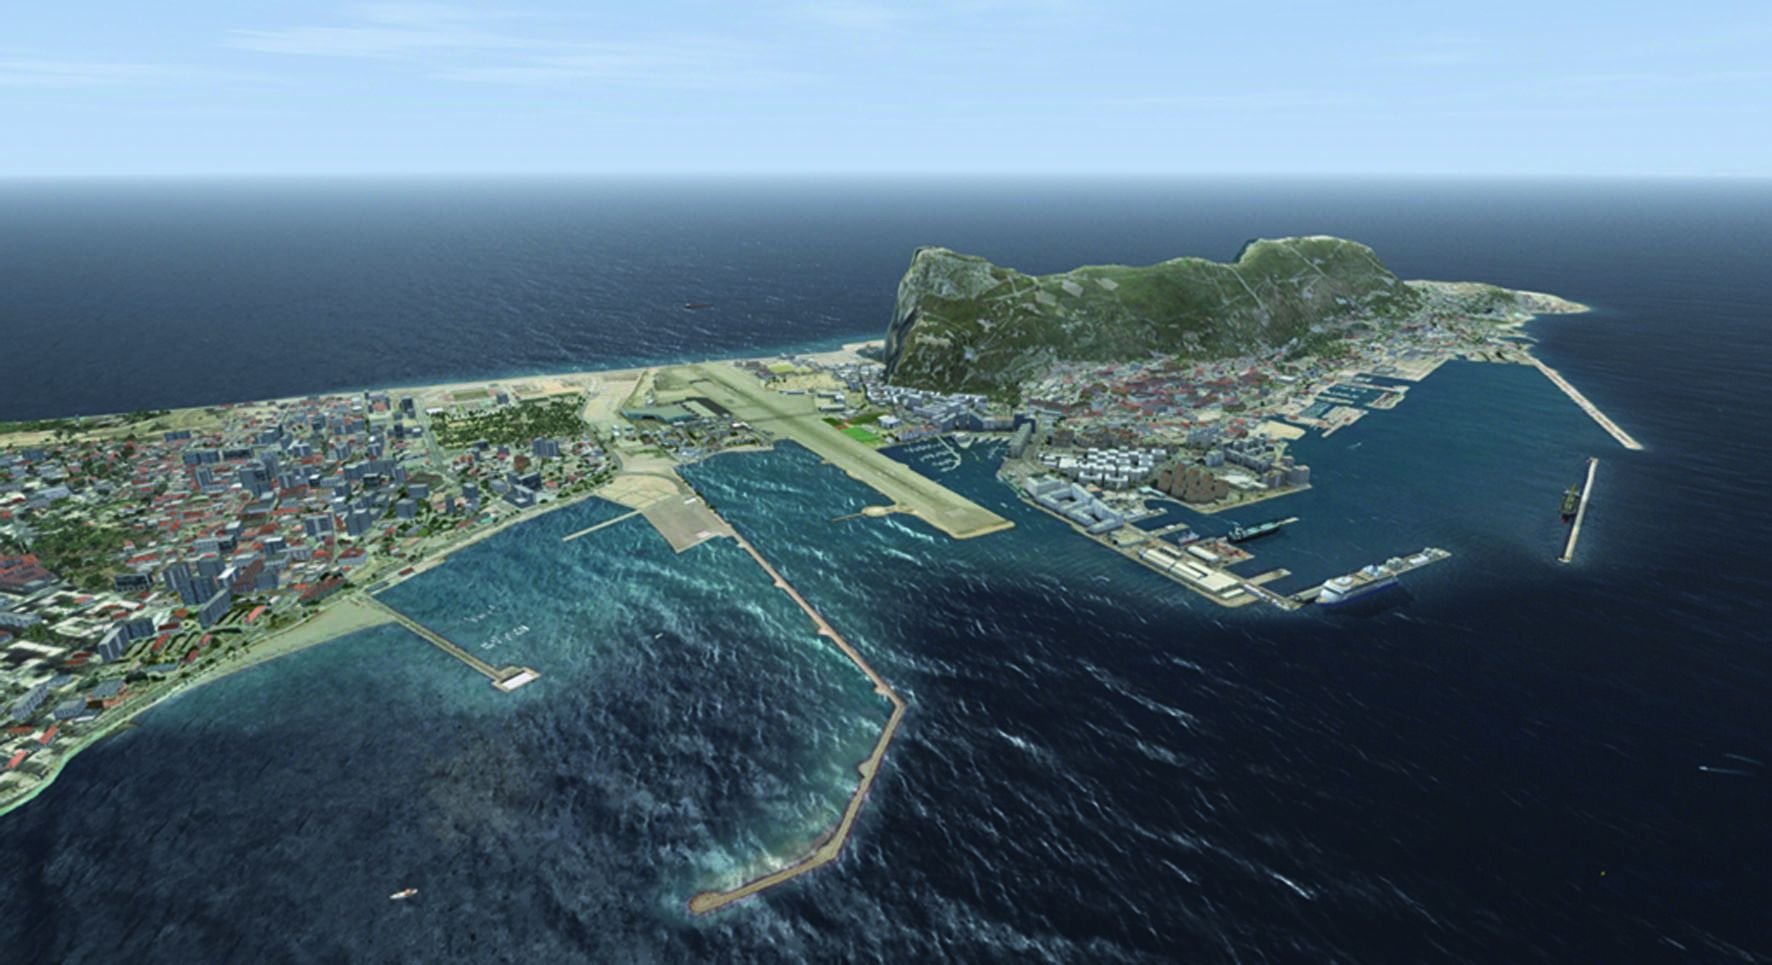 google earth vr,virtual reality vr